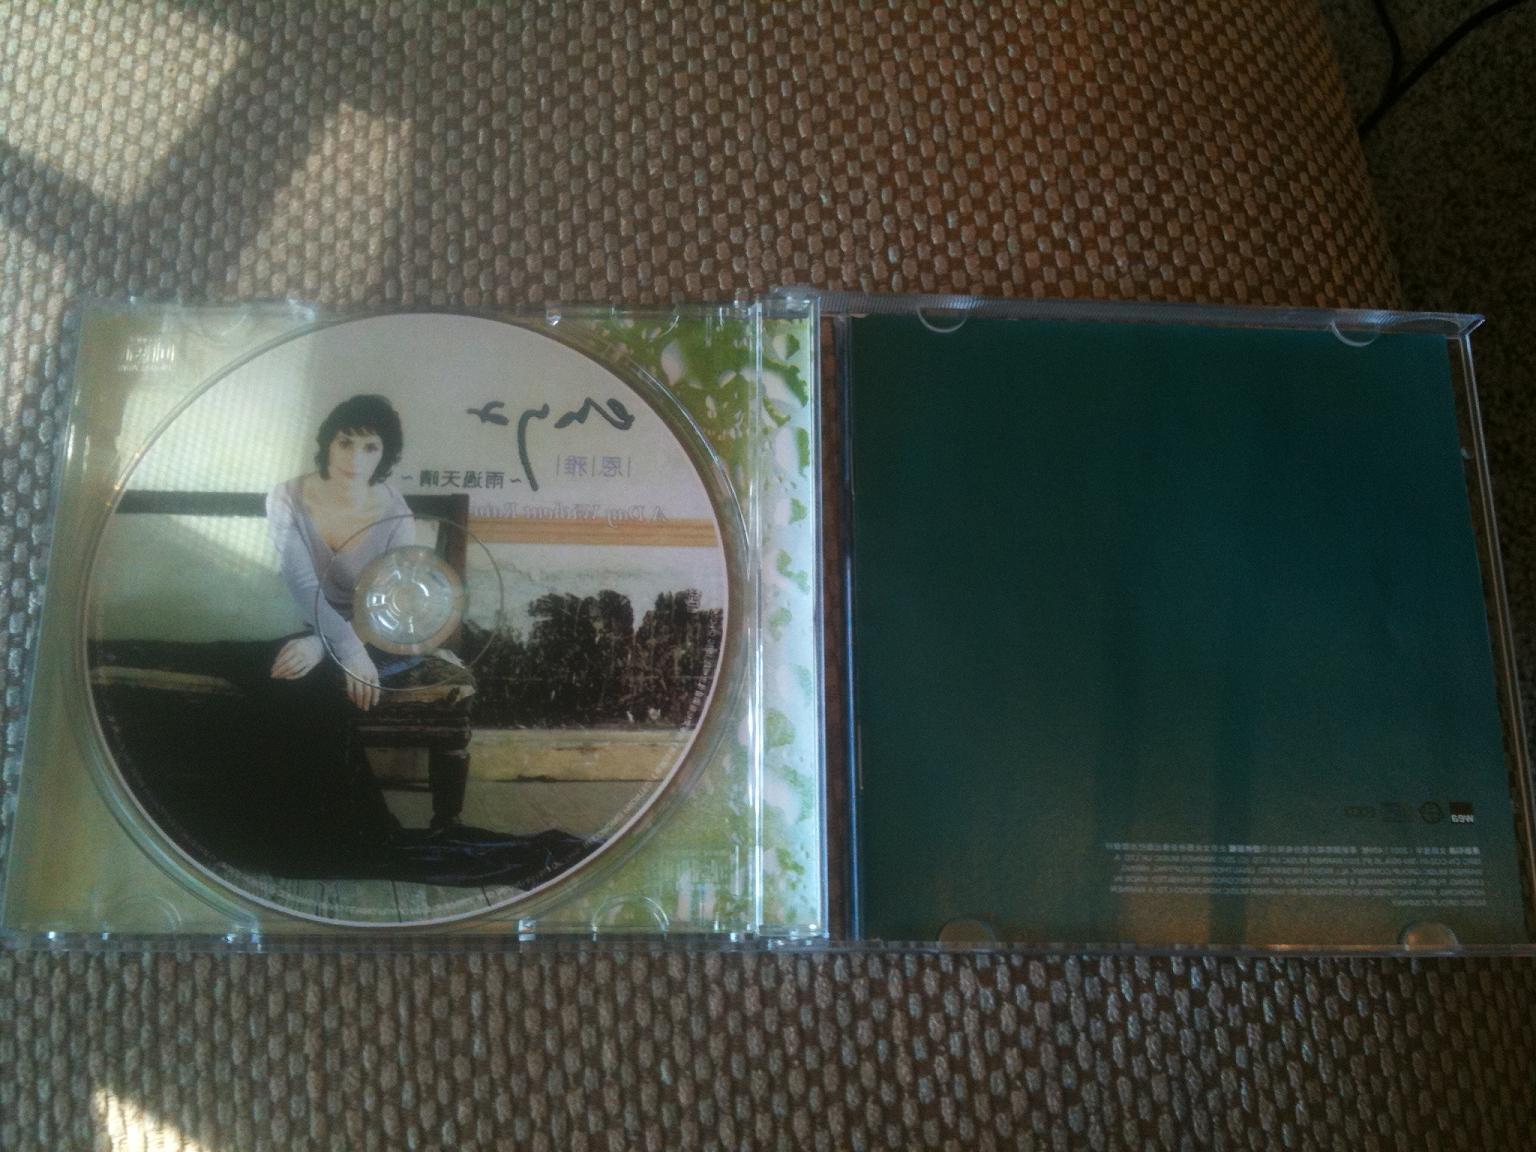 Enya CDs 202.JPG